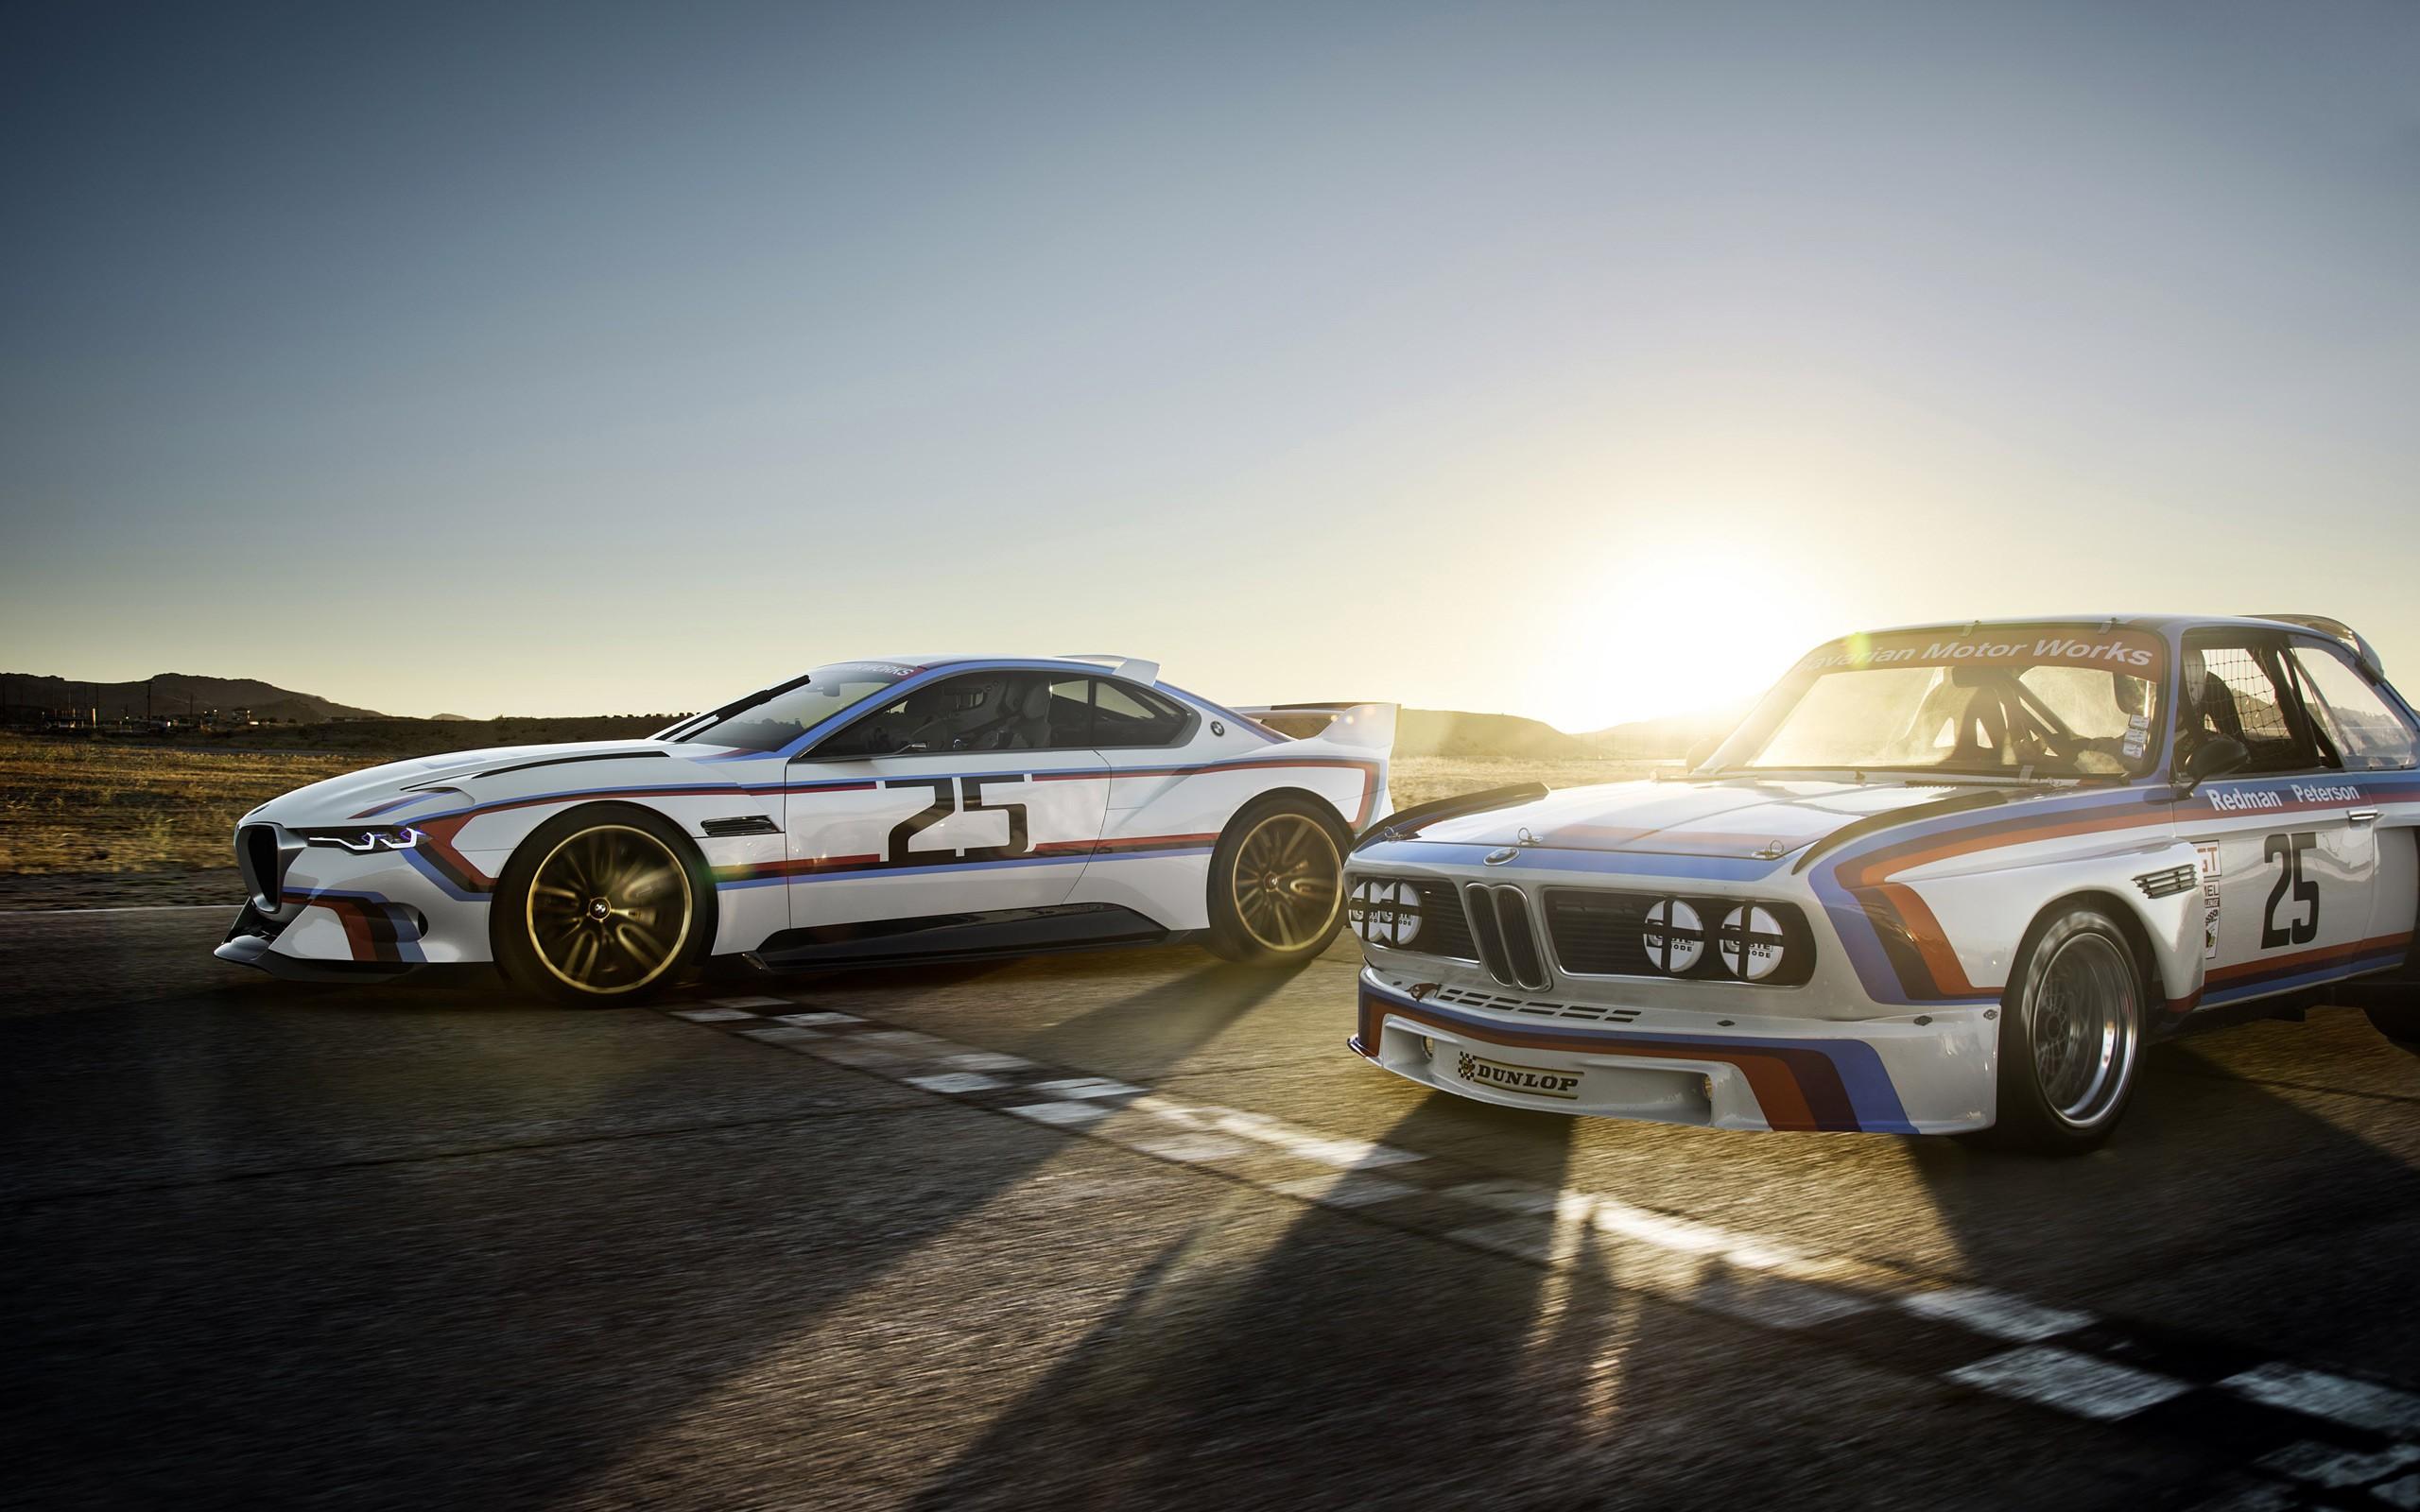 Wallpaper Sunset Concept Cars Sports Car Bmw 3 0 Csl